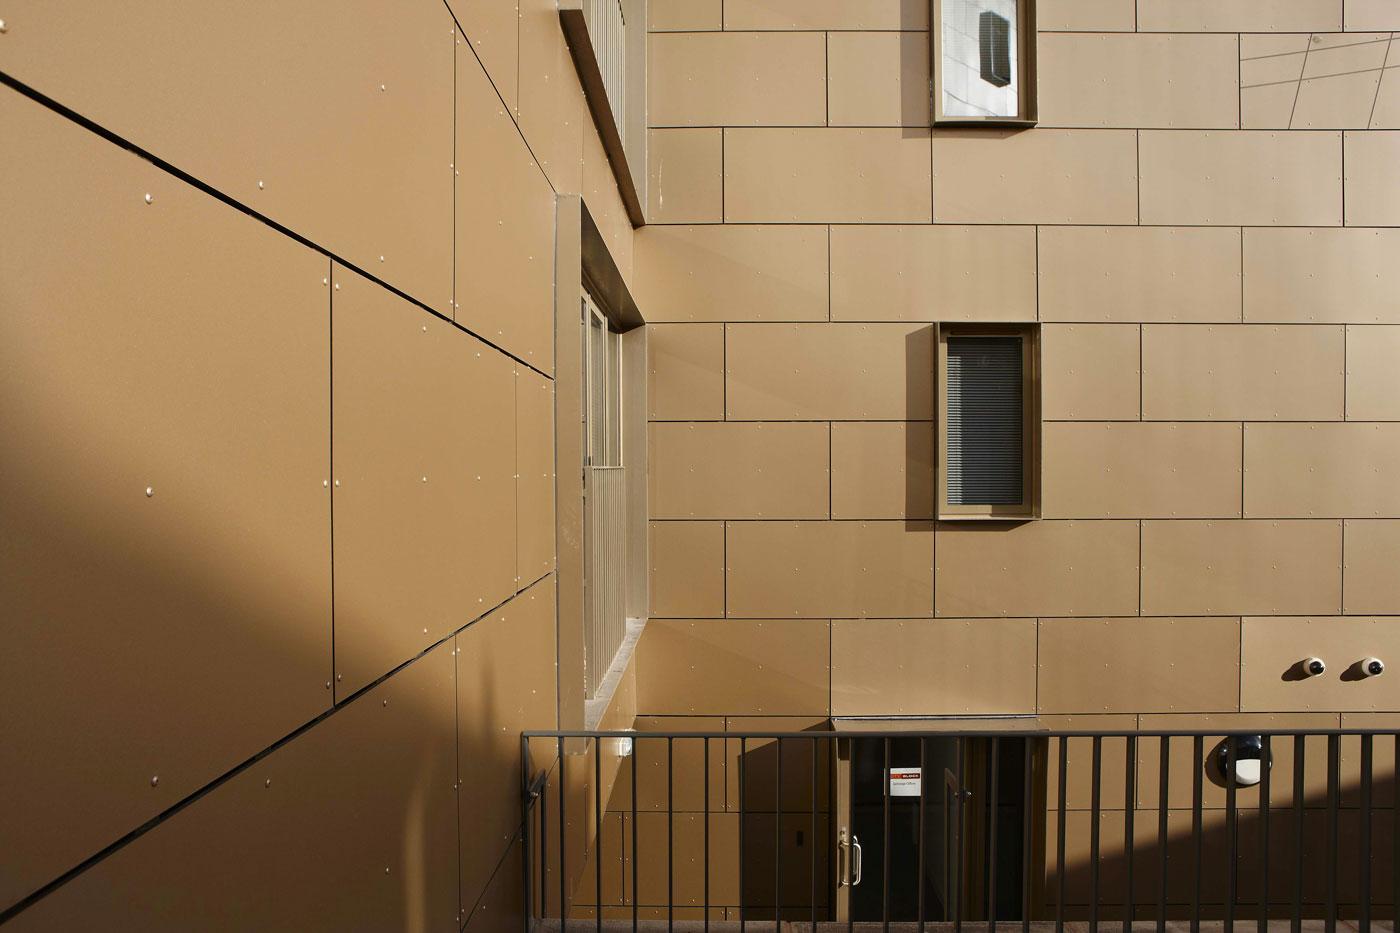 City Block Student Accommodation, Lancaster   Construction Building Photographer